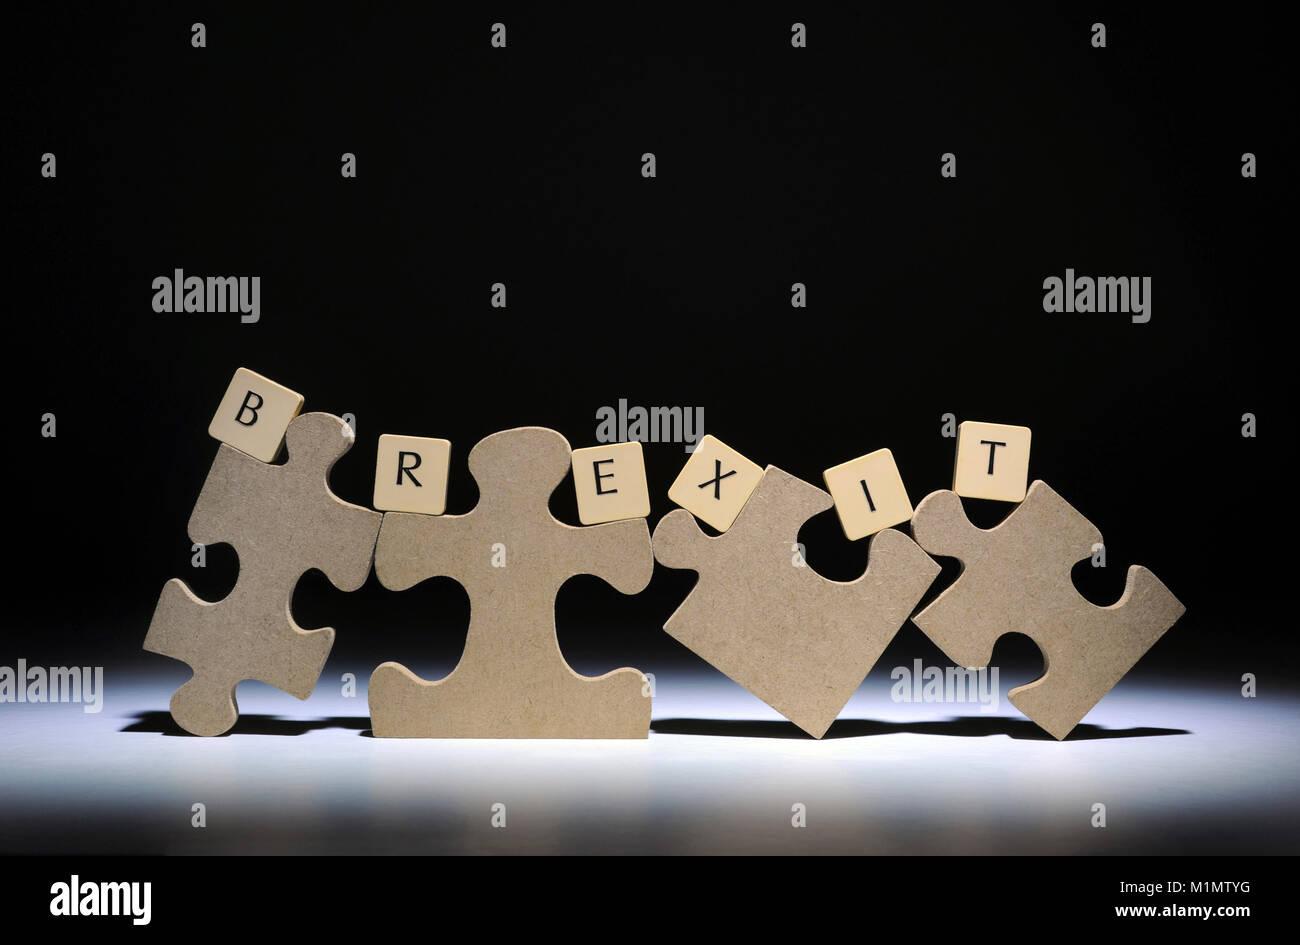 JIGSAW PIECES WITH WORD TILES SPELLING 'BREXIT' RE THE EU EUROPEAN UNION BREXIT LEAVE REFERENDUM ETC UK - Stock Image